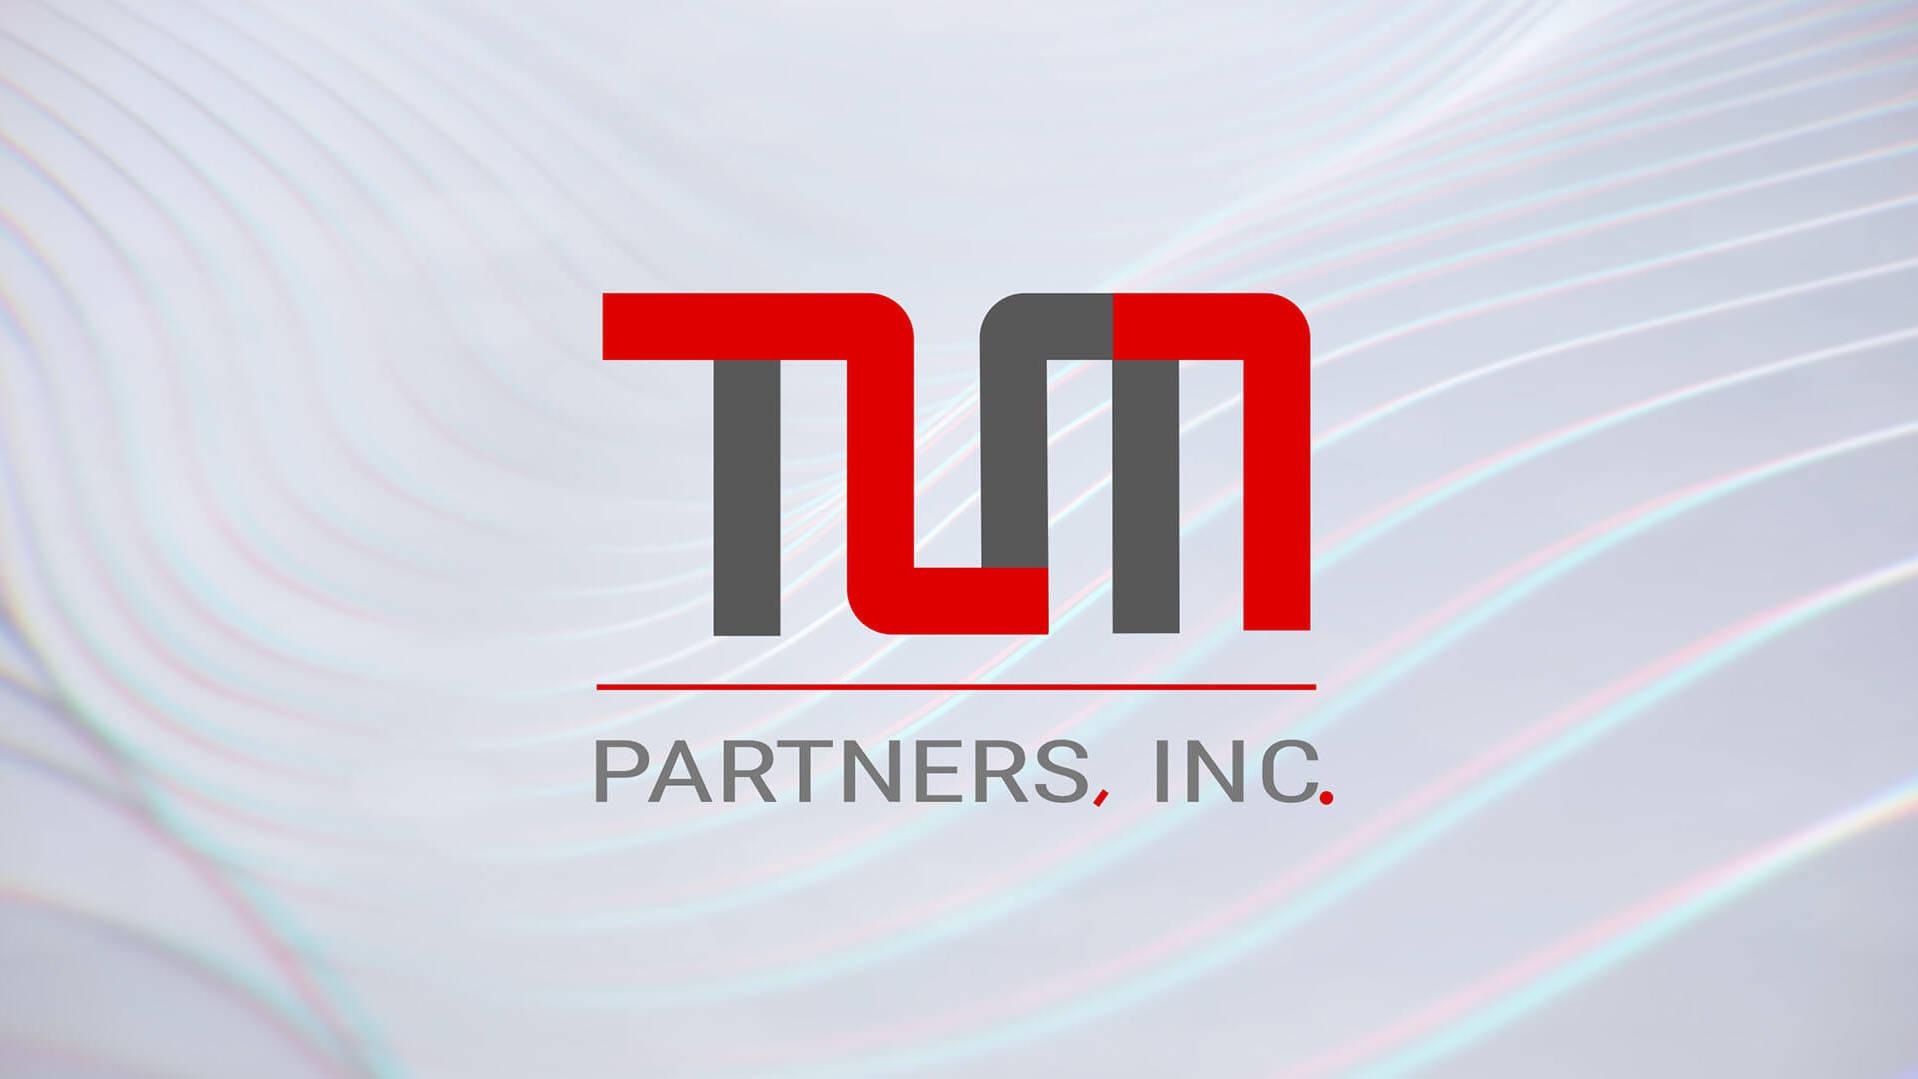 TLM News graphic